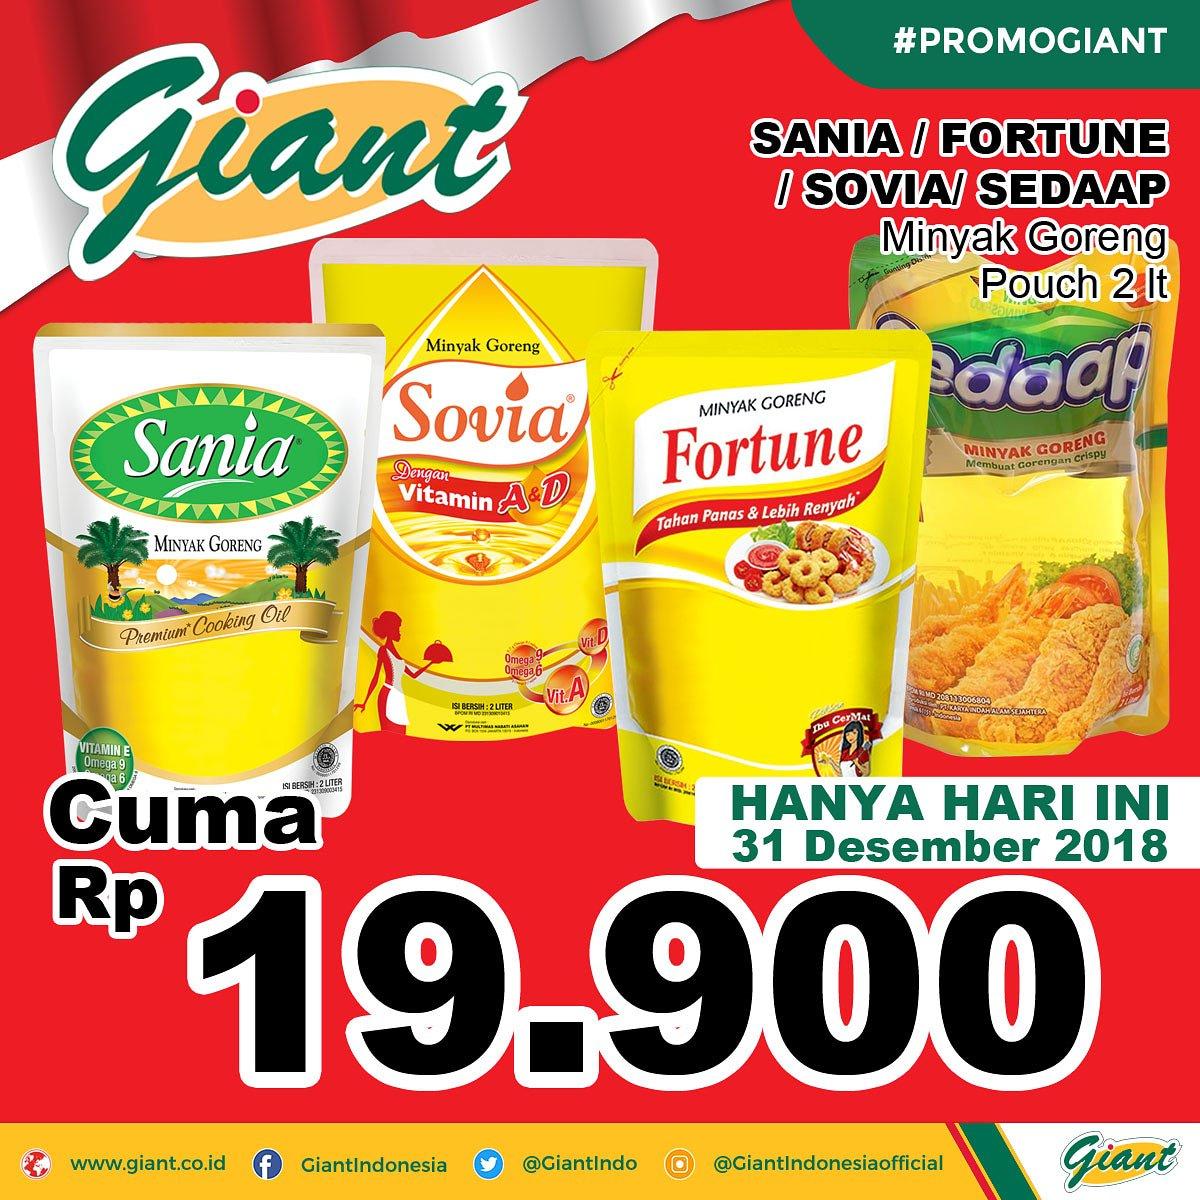 #Giant - Promo Minyak Sania / Fortune / Sovia / Sedaap 2L Cuma 19K (HARI INI)